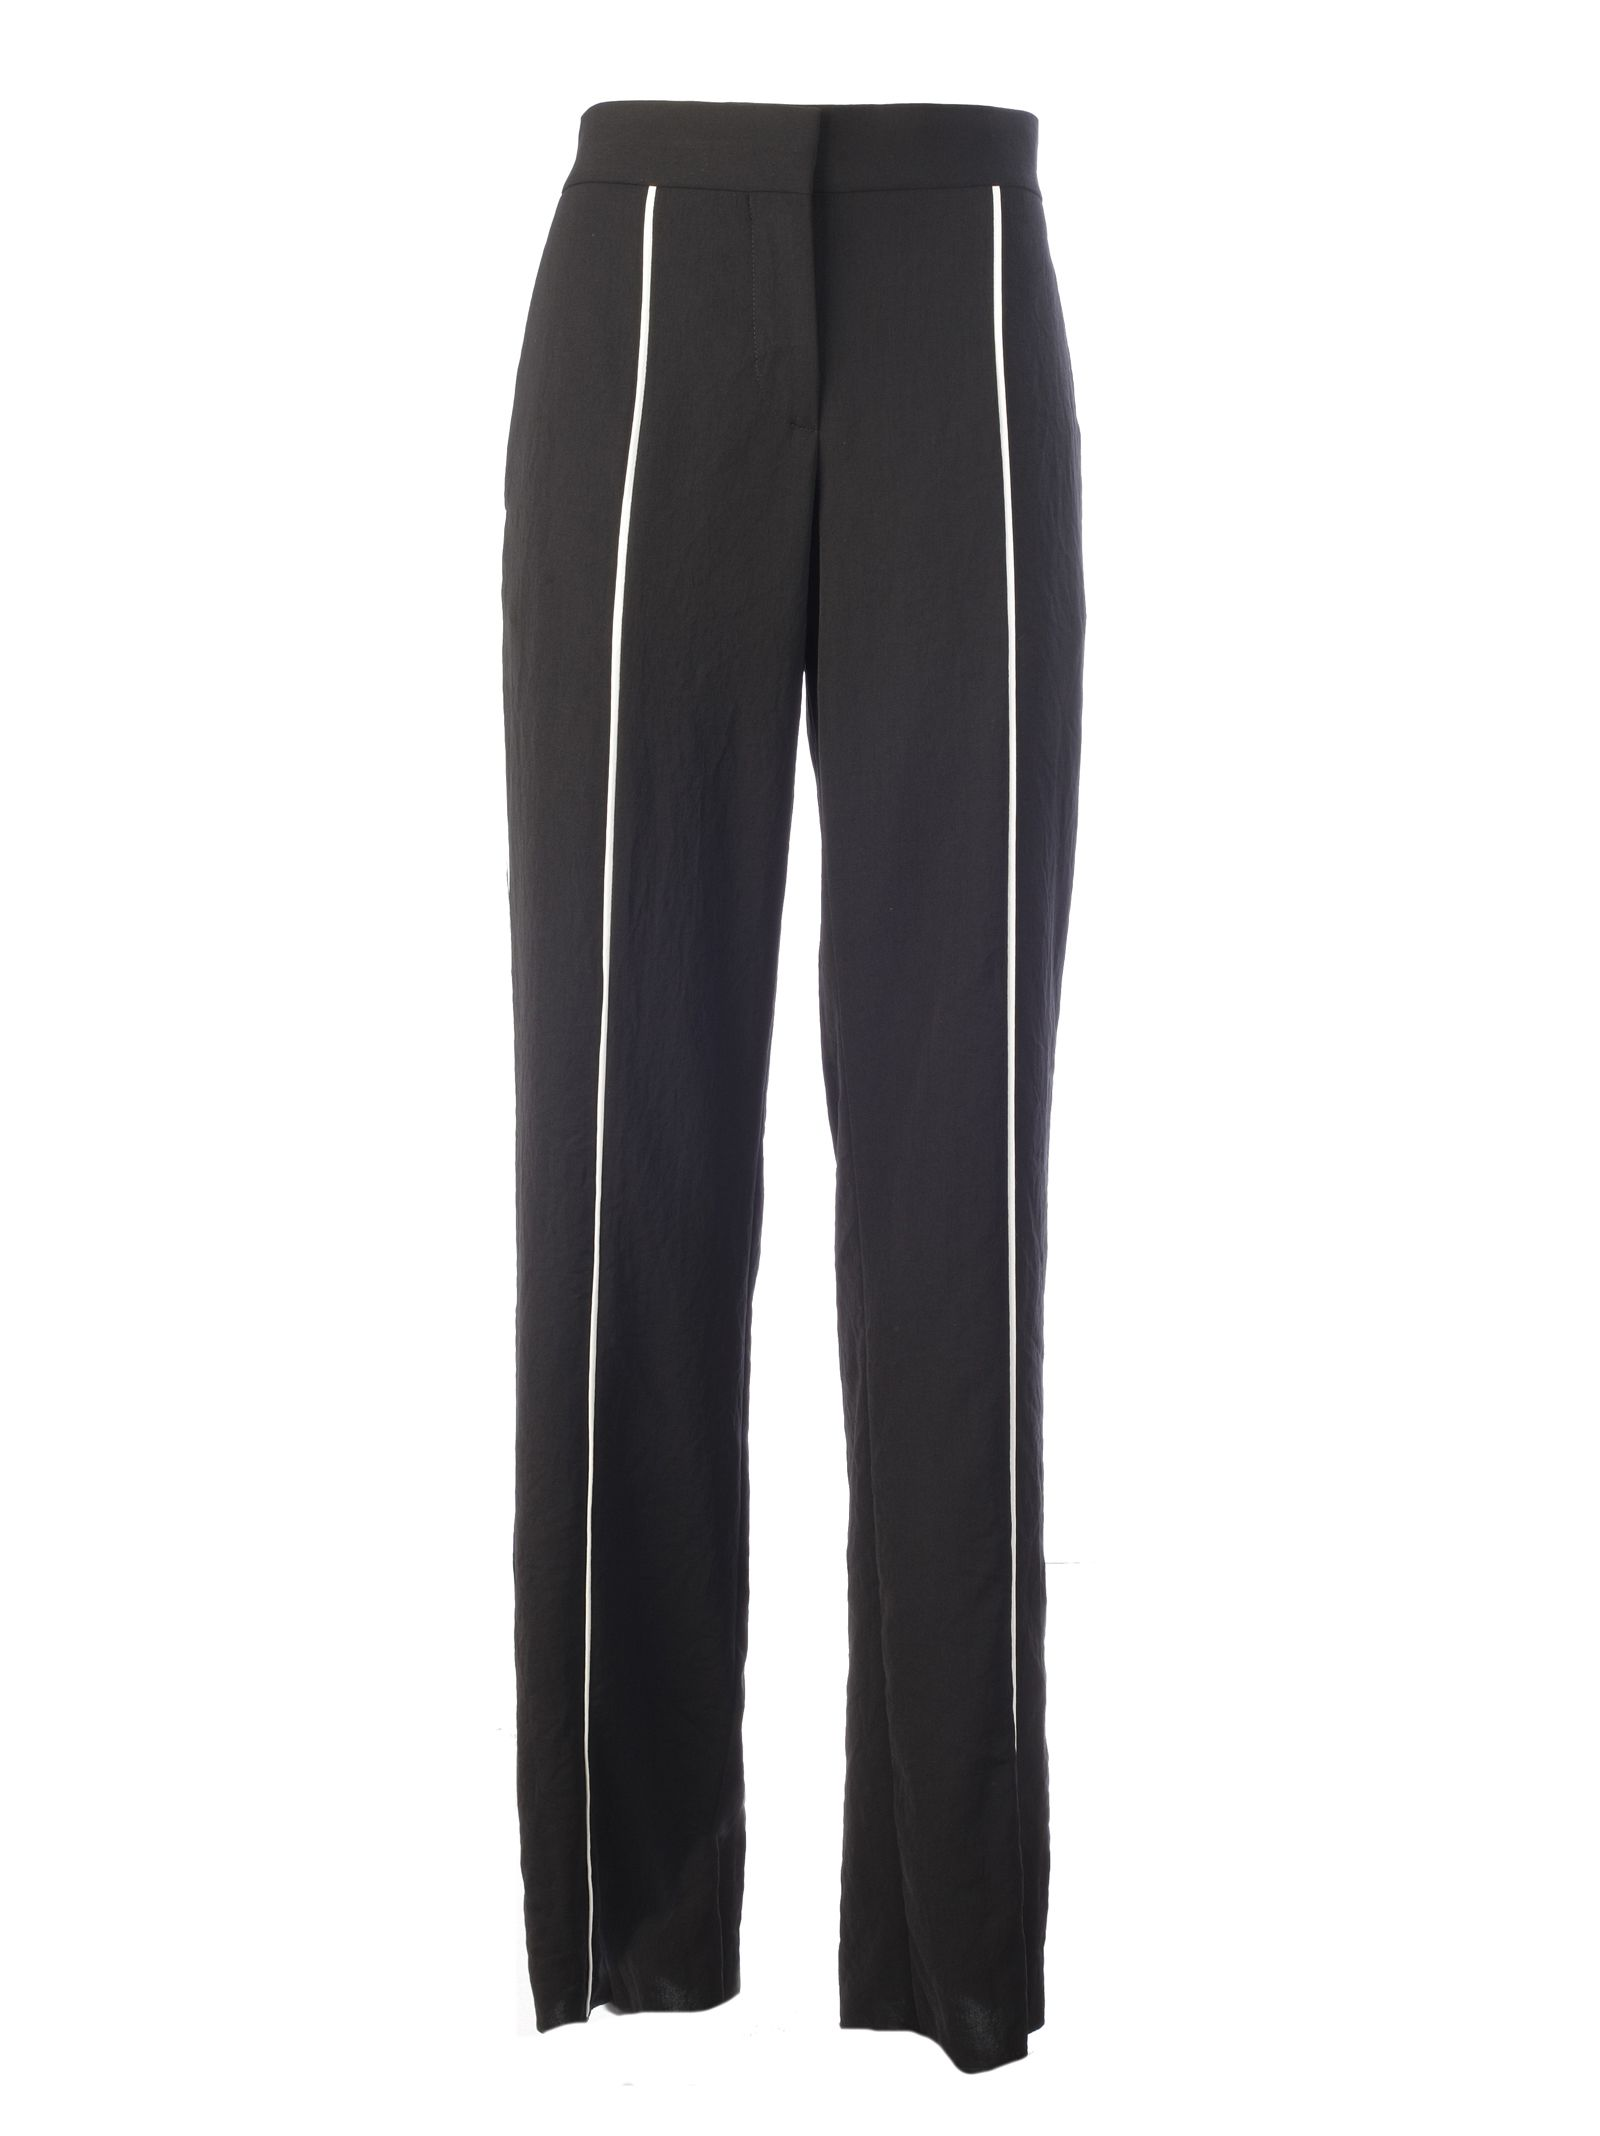 Loewe Piping Trousers